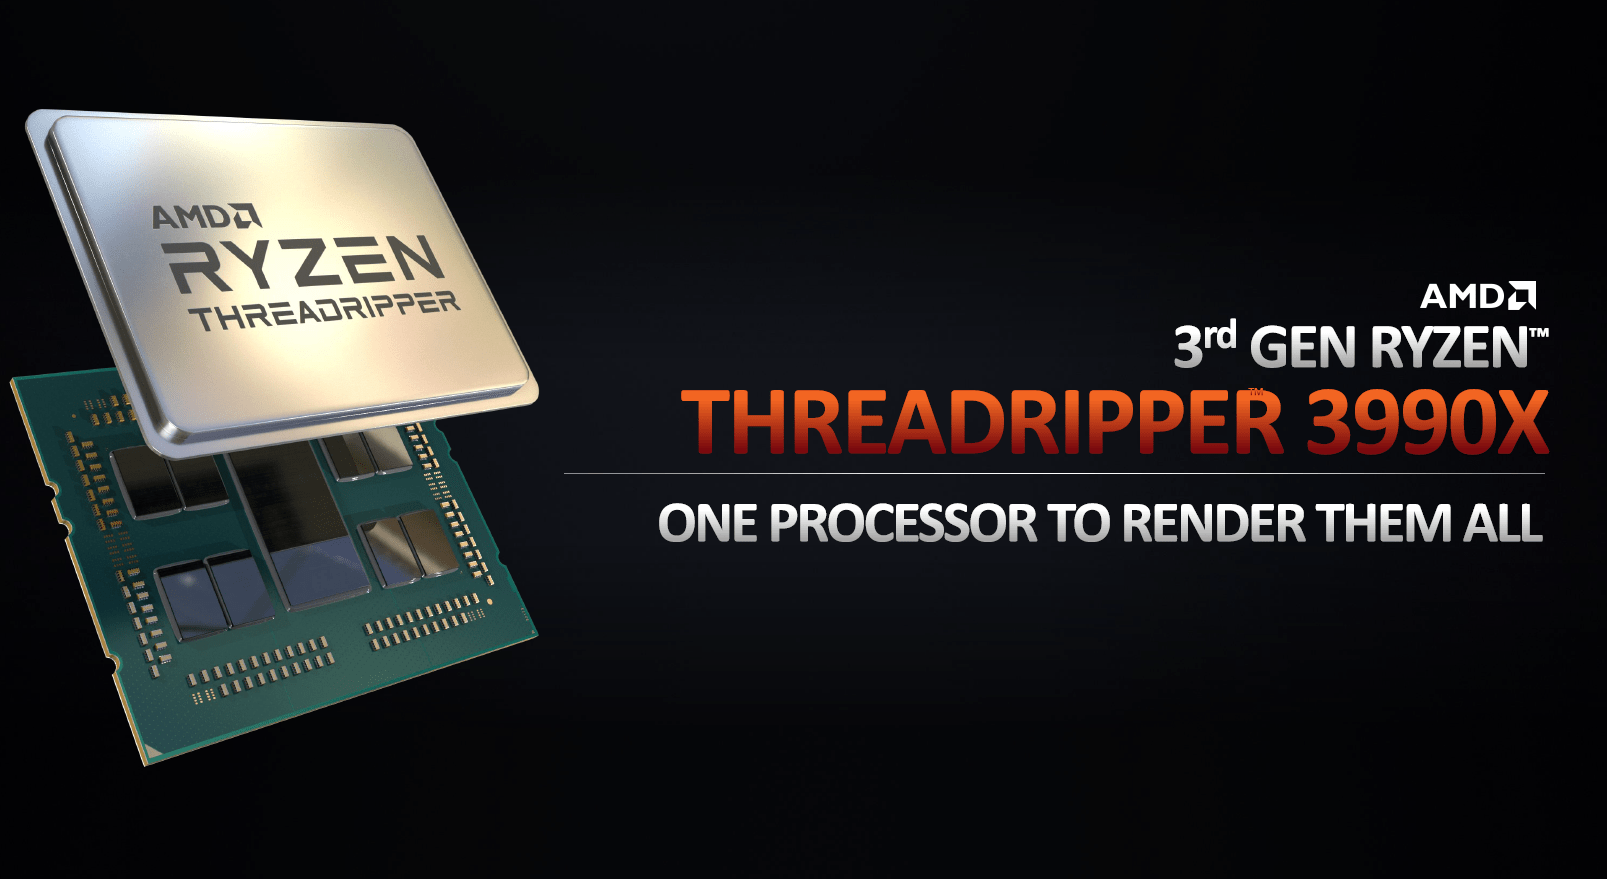 AMD bewirbt die CPU als die beste Render-Lösung